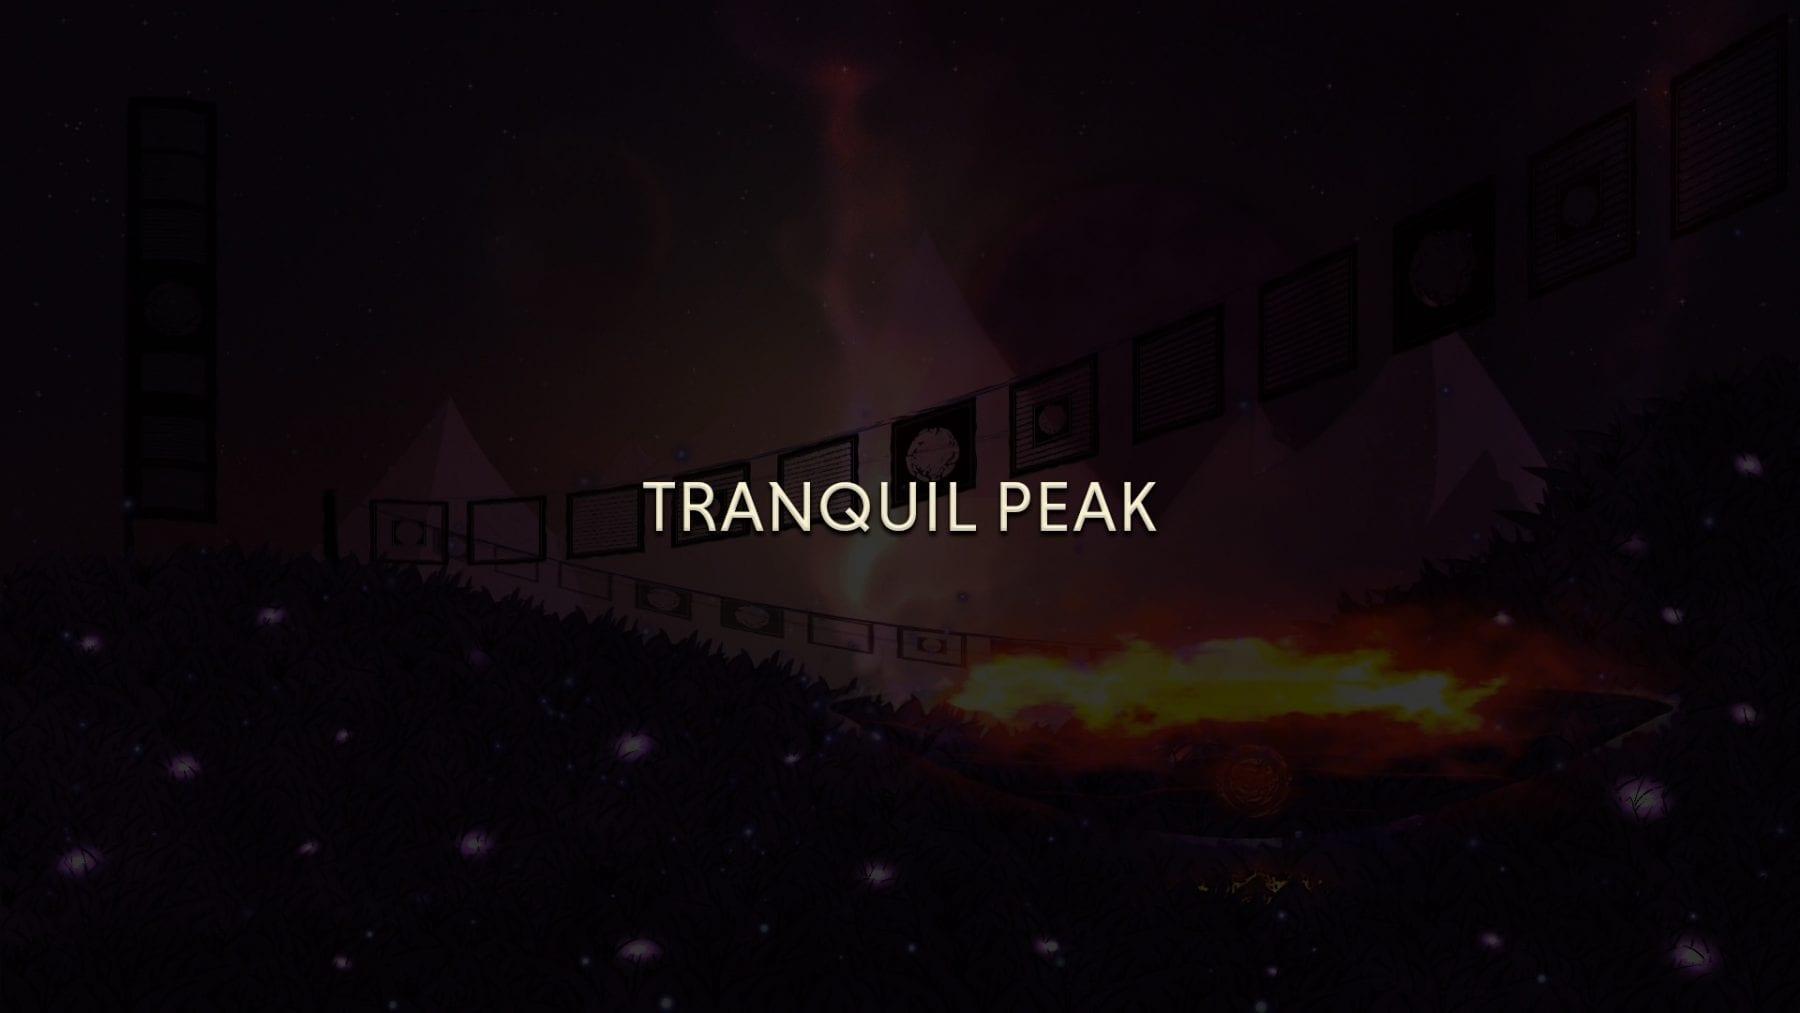 tranquil peak darkened